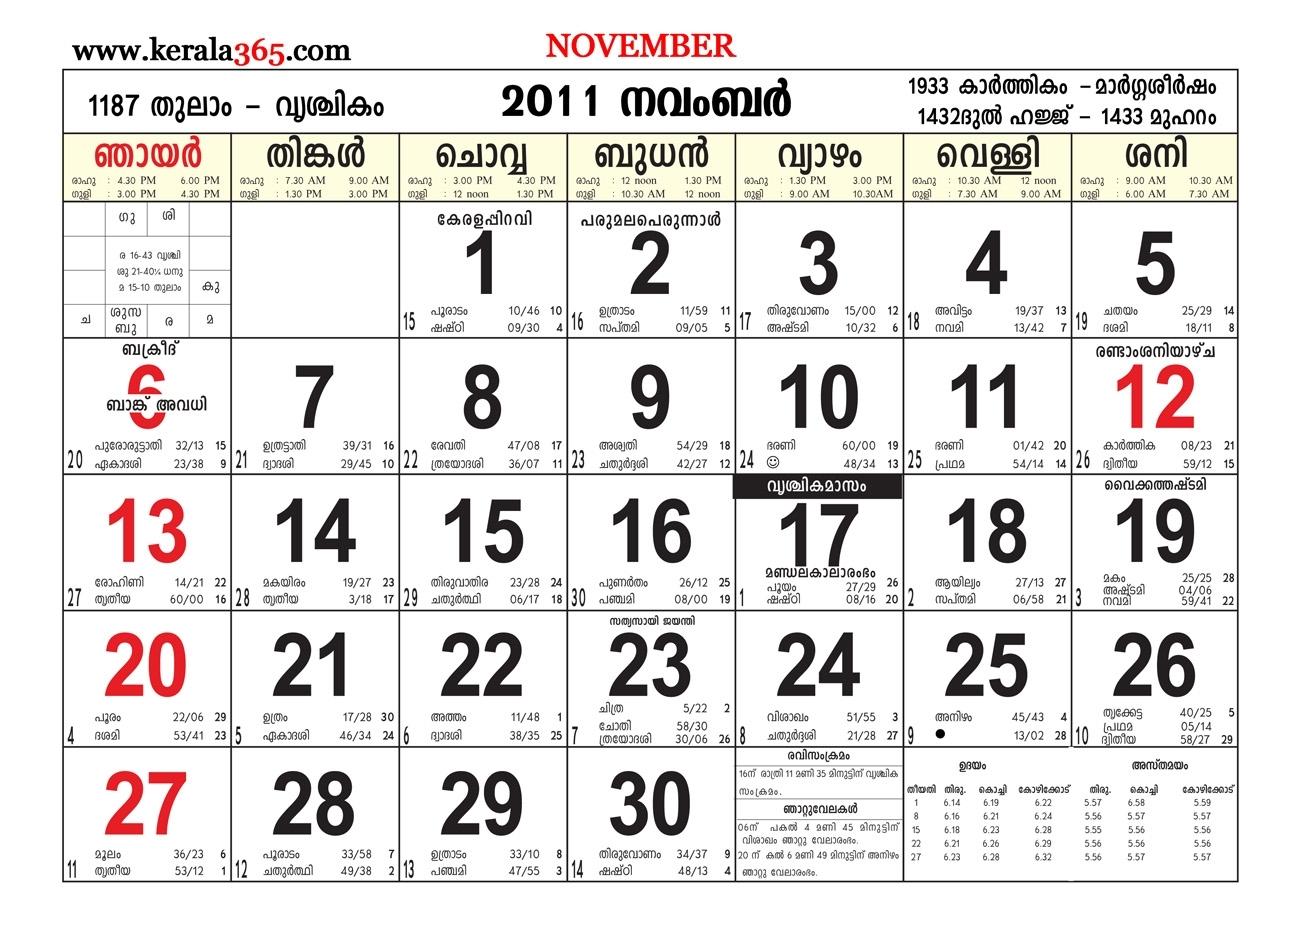 Free August 2015 Calendar Printable - Printable Calendar & Birthday with regard to November 2015 Malayala Manorama Calendar